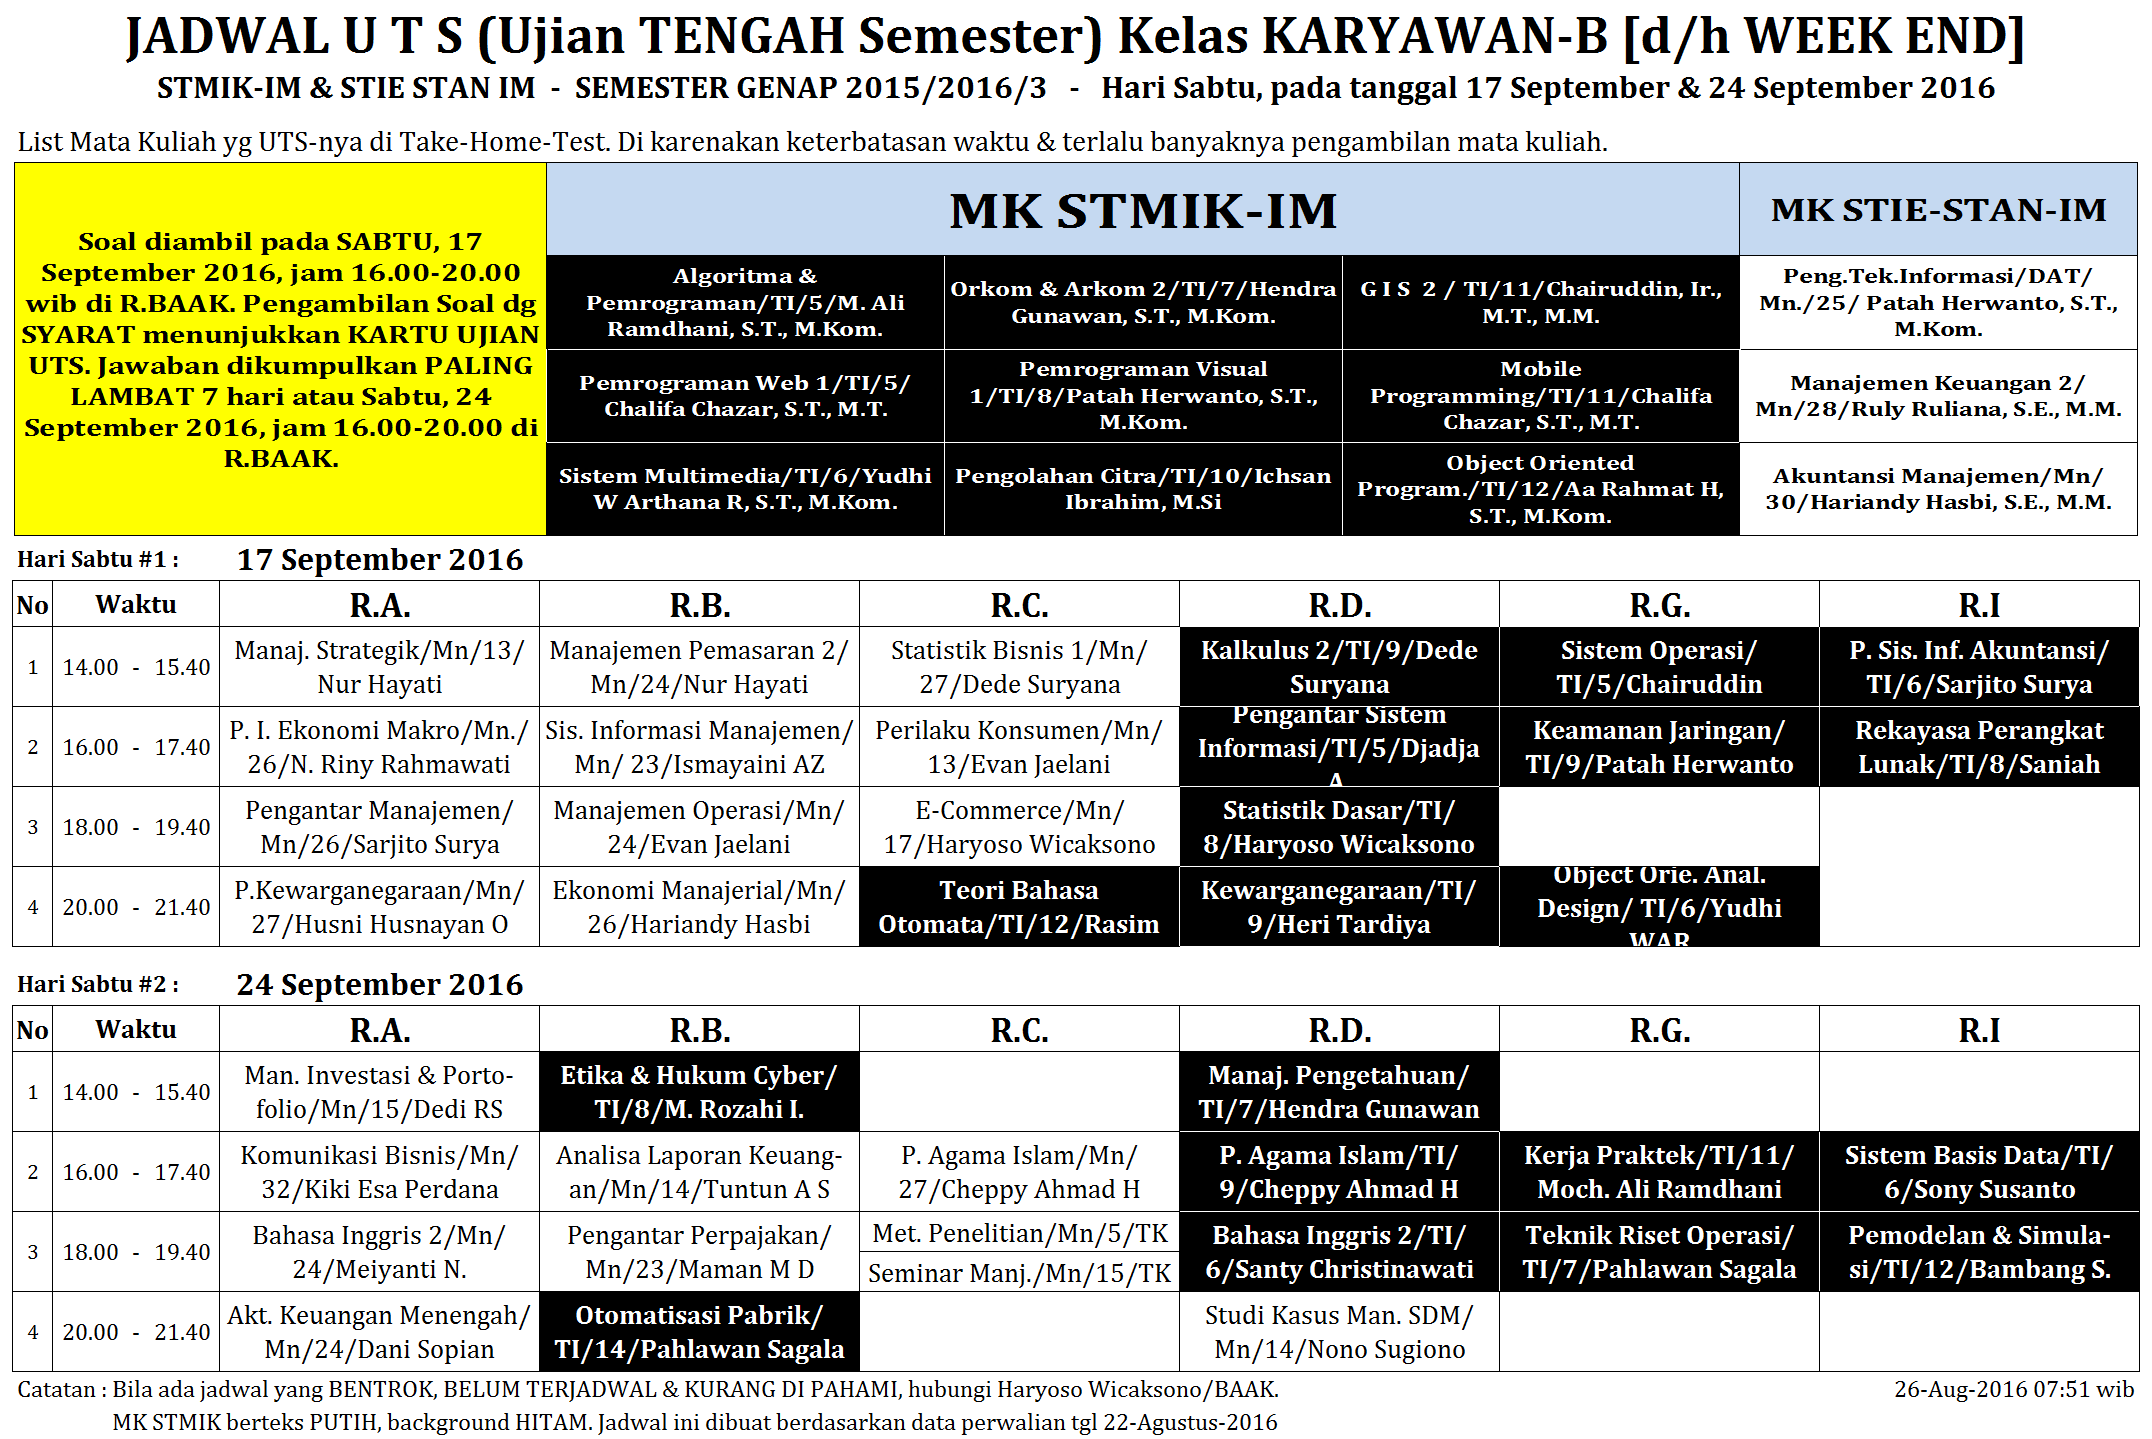 Jadwal UTS K-B 1